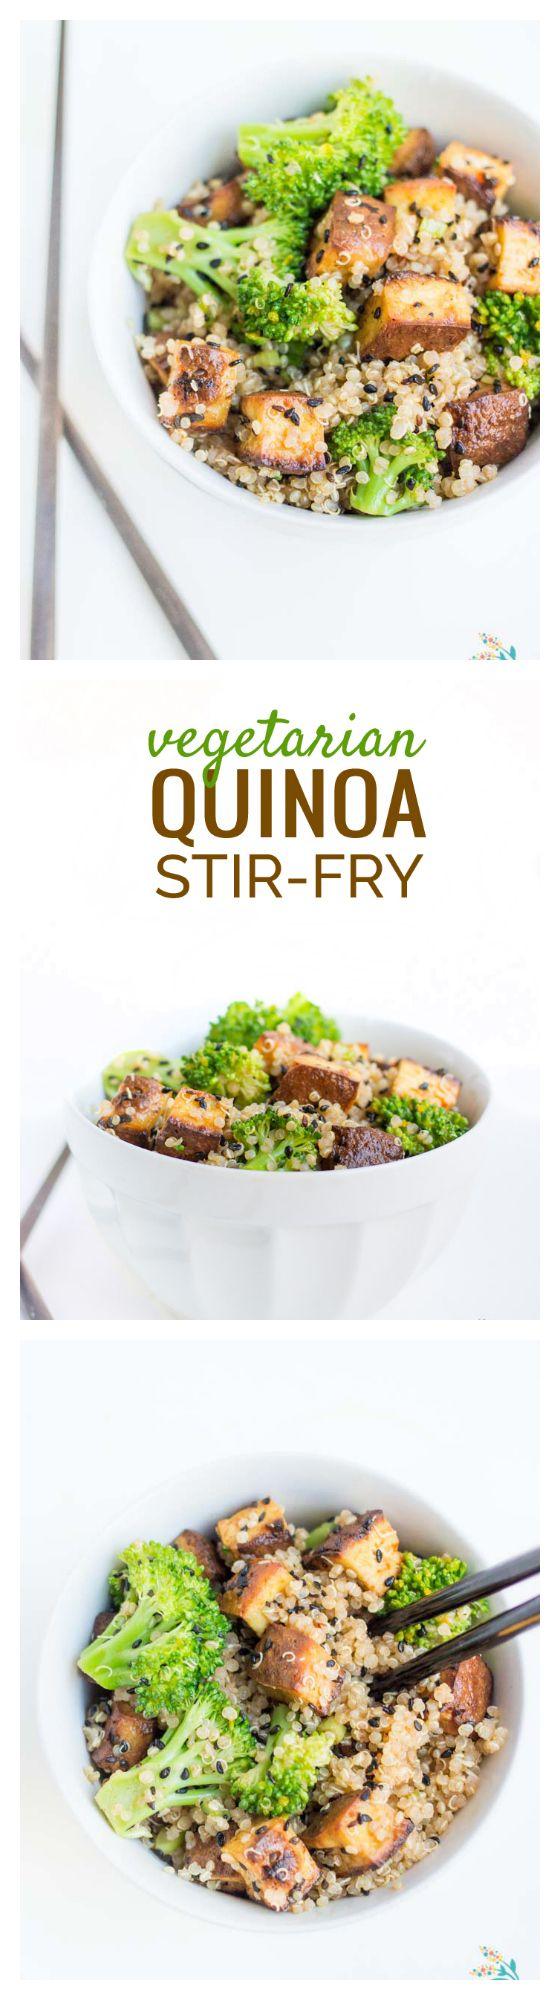 EASY dinner idea: this #vegetarian quinoa stir-fry made with CRISPY baked tofu…